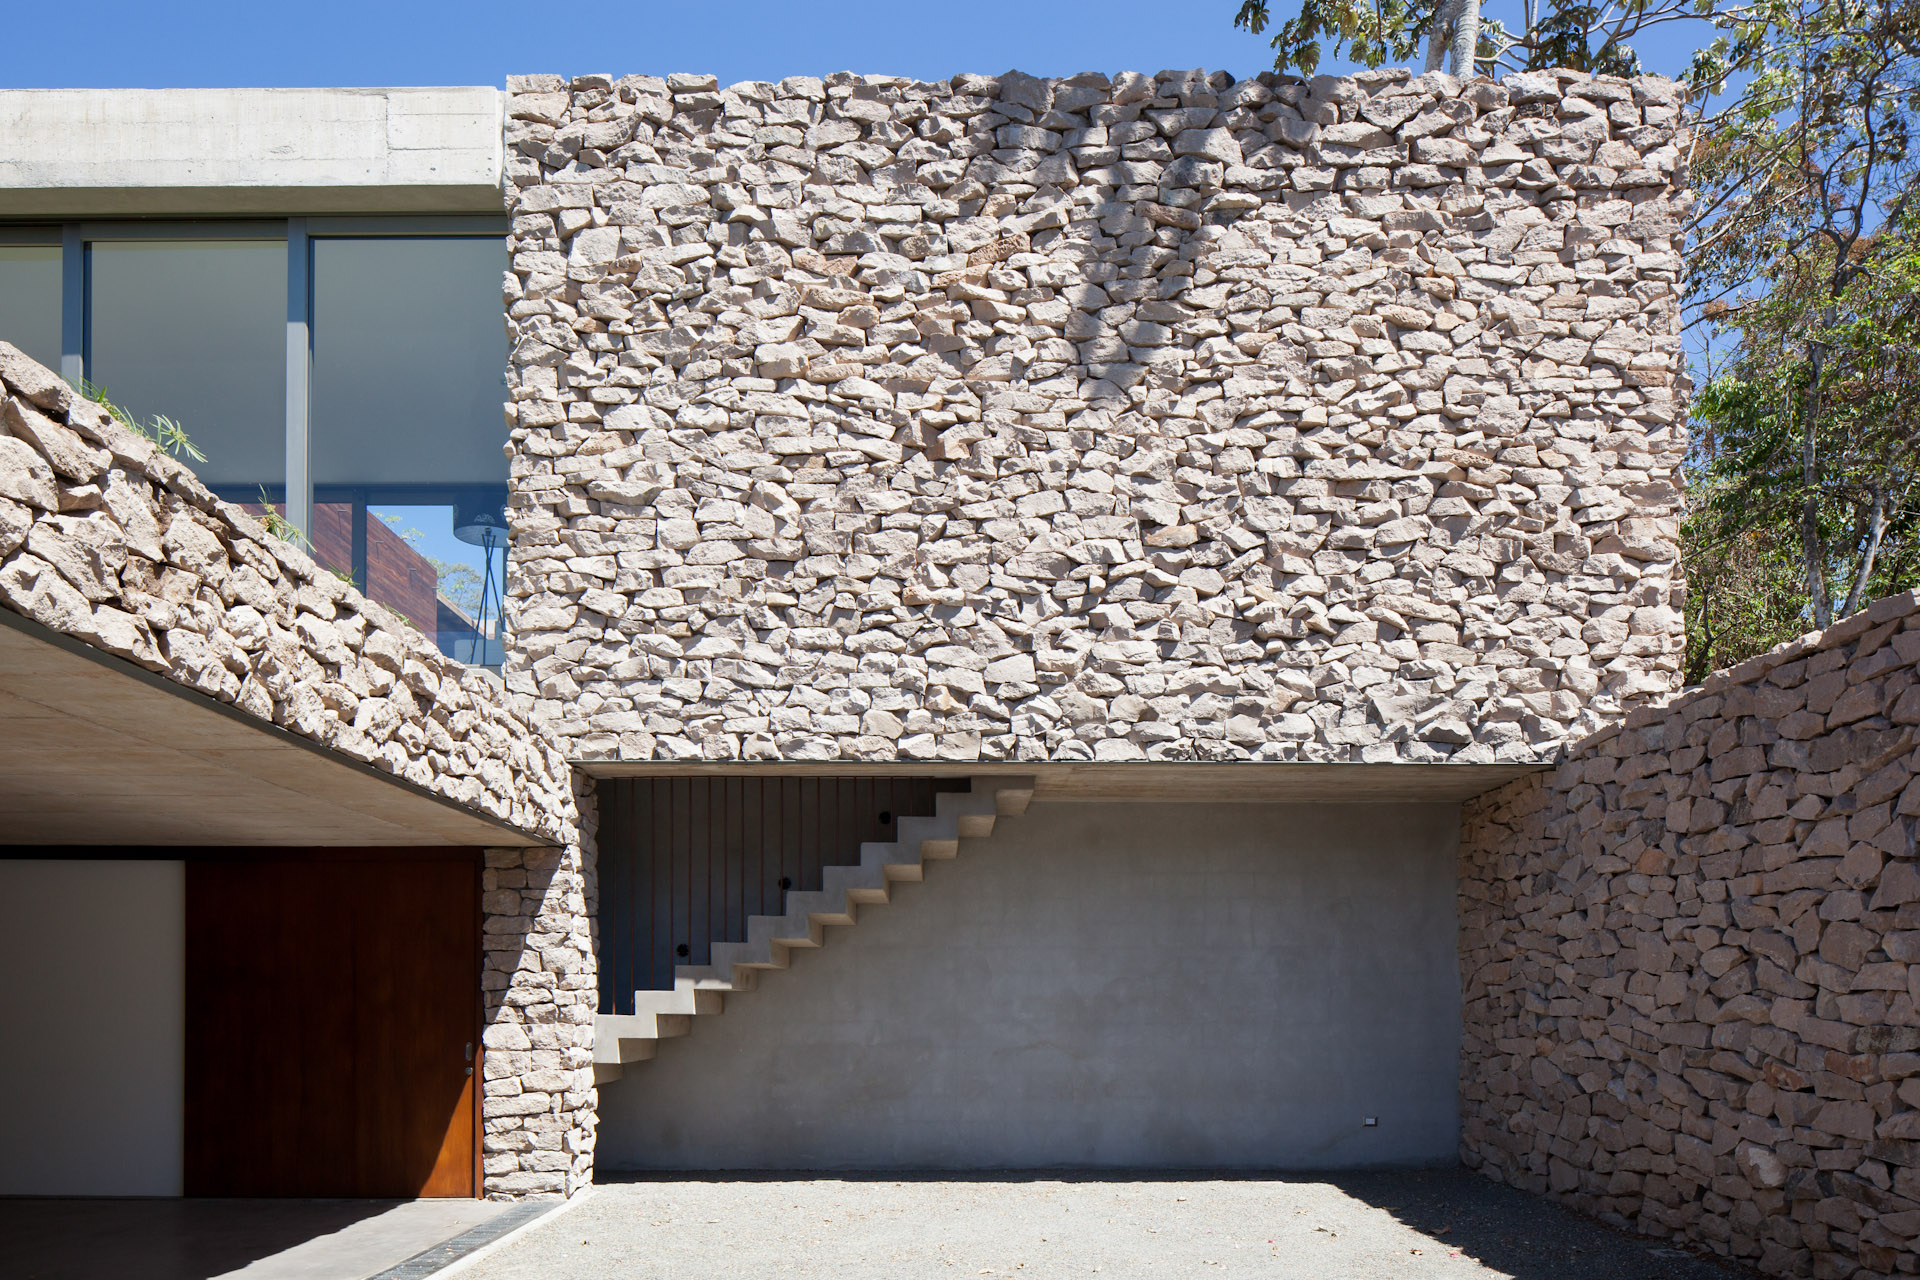 Architecture-Modern-Casa-Jardin-El-Salvador-Jason-Bax-02.JPG